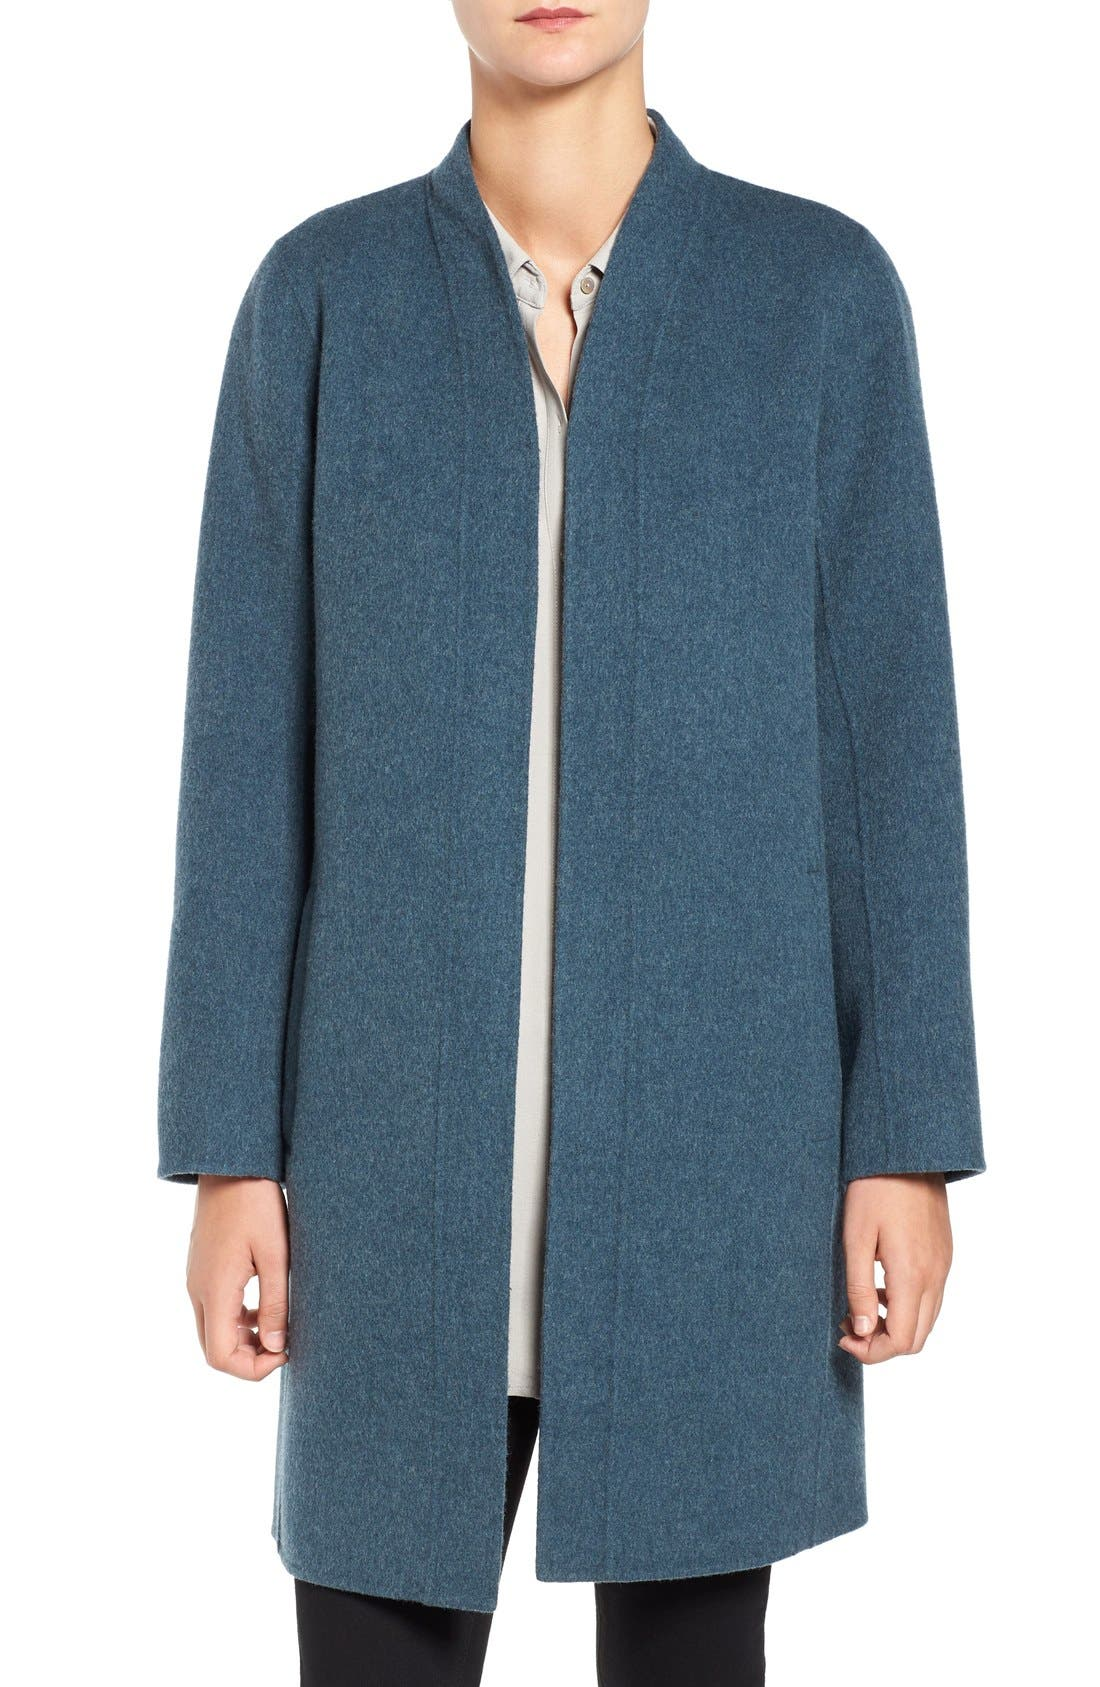 Main Image - Eileen Fisher Double Face Brushed Wool Blend Kimono Jacket